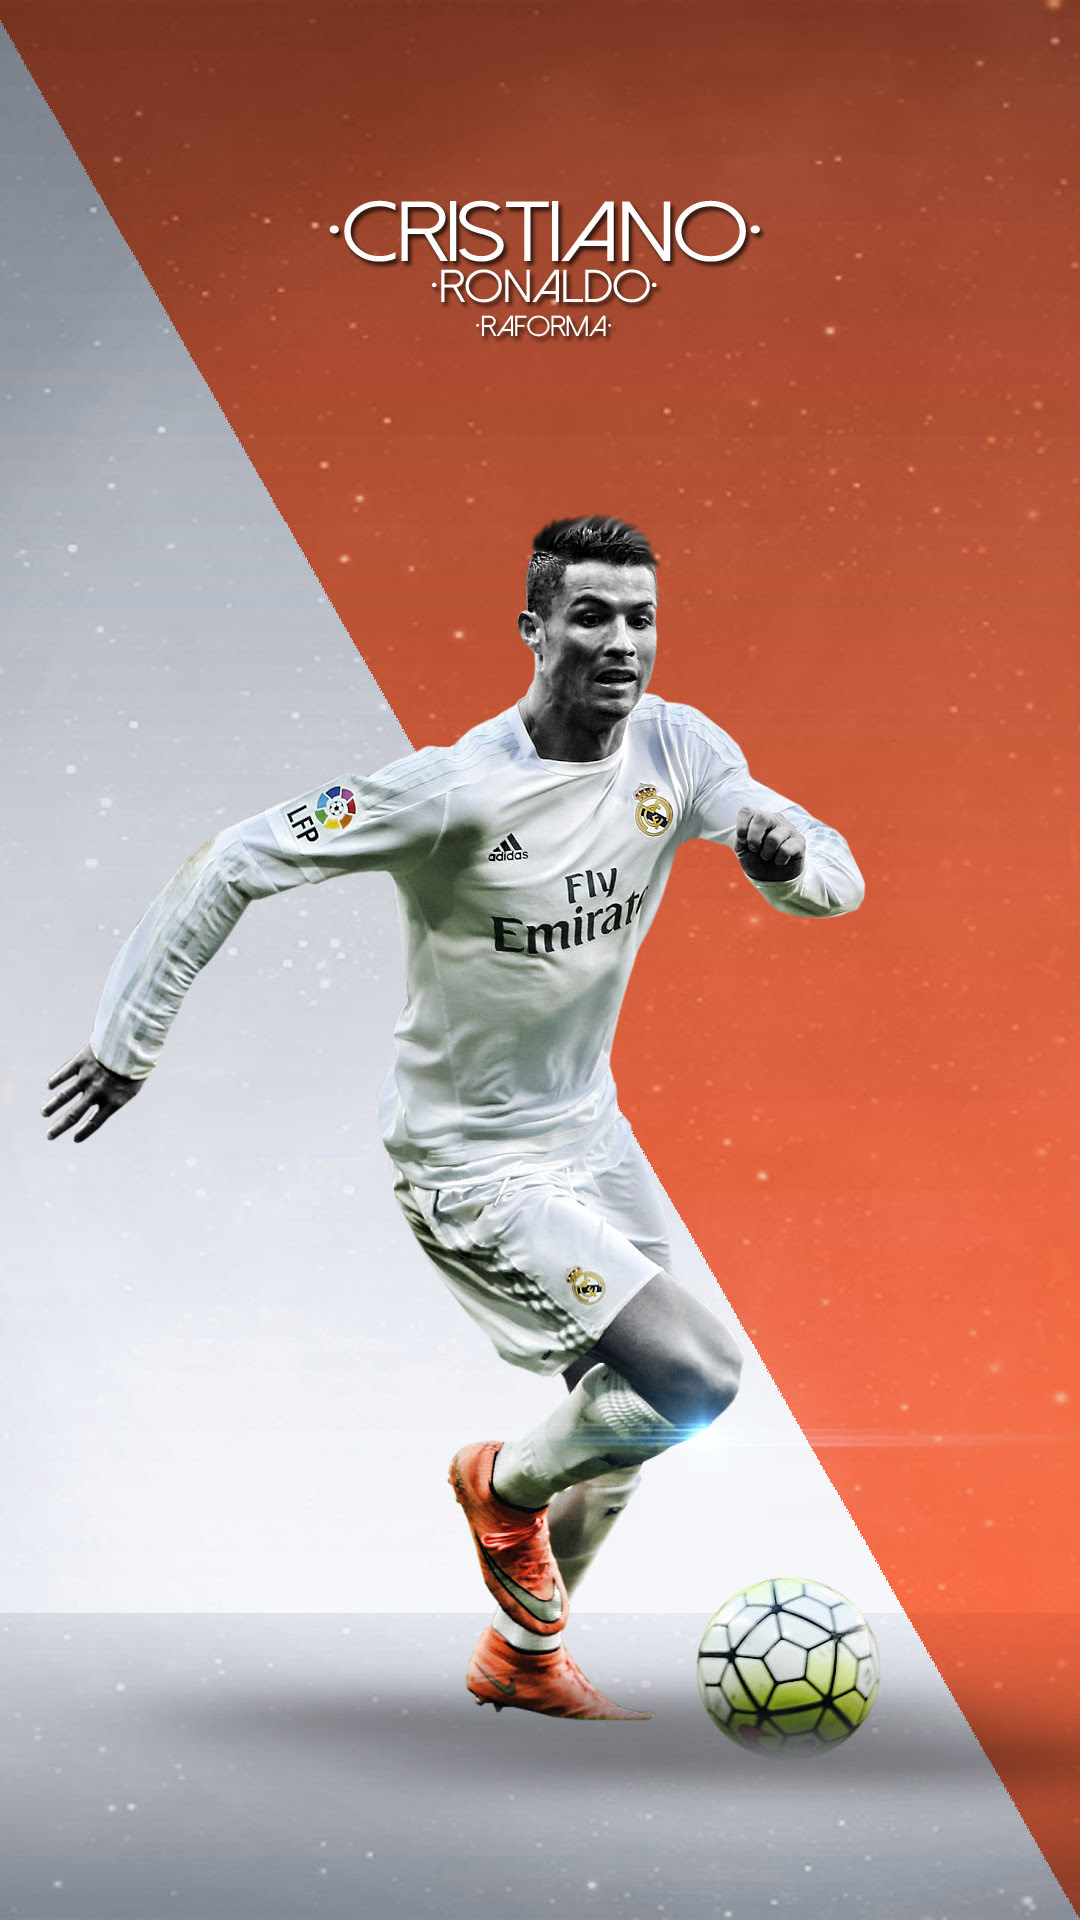 Cristiano Ronaldo 4k Wallpaper For Android